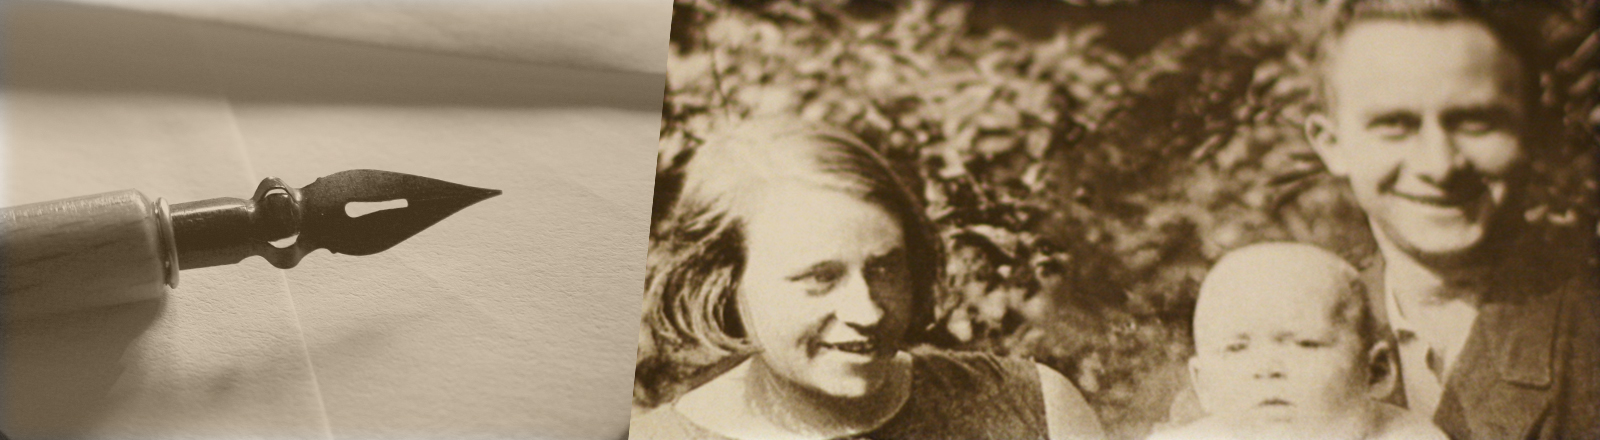 Stolze Eltern: Käthchen Hespers, Dietrich Franz Hespers, Theo Hespers